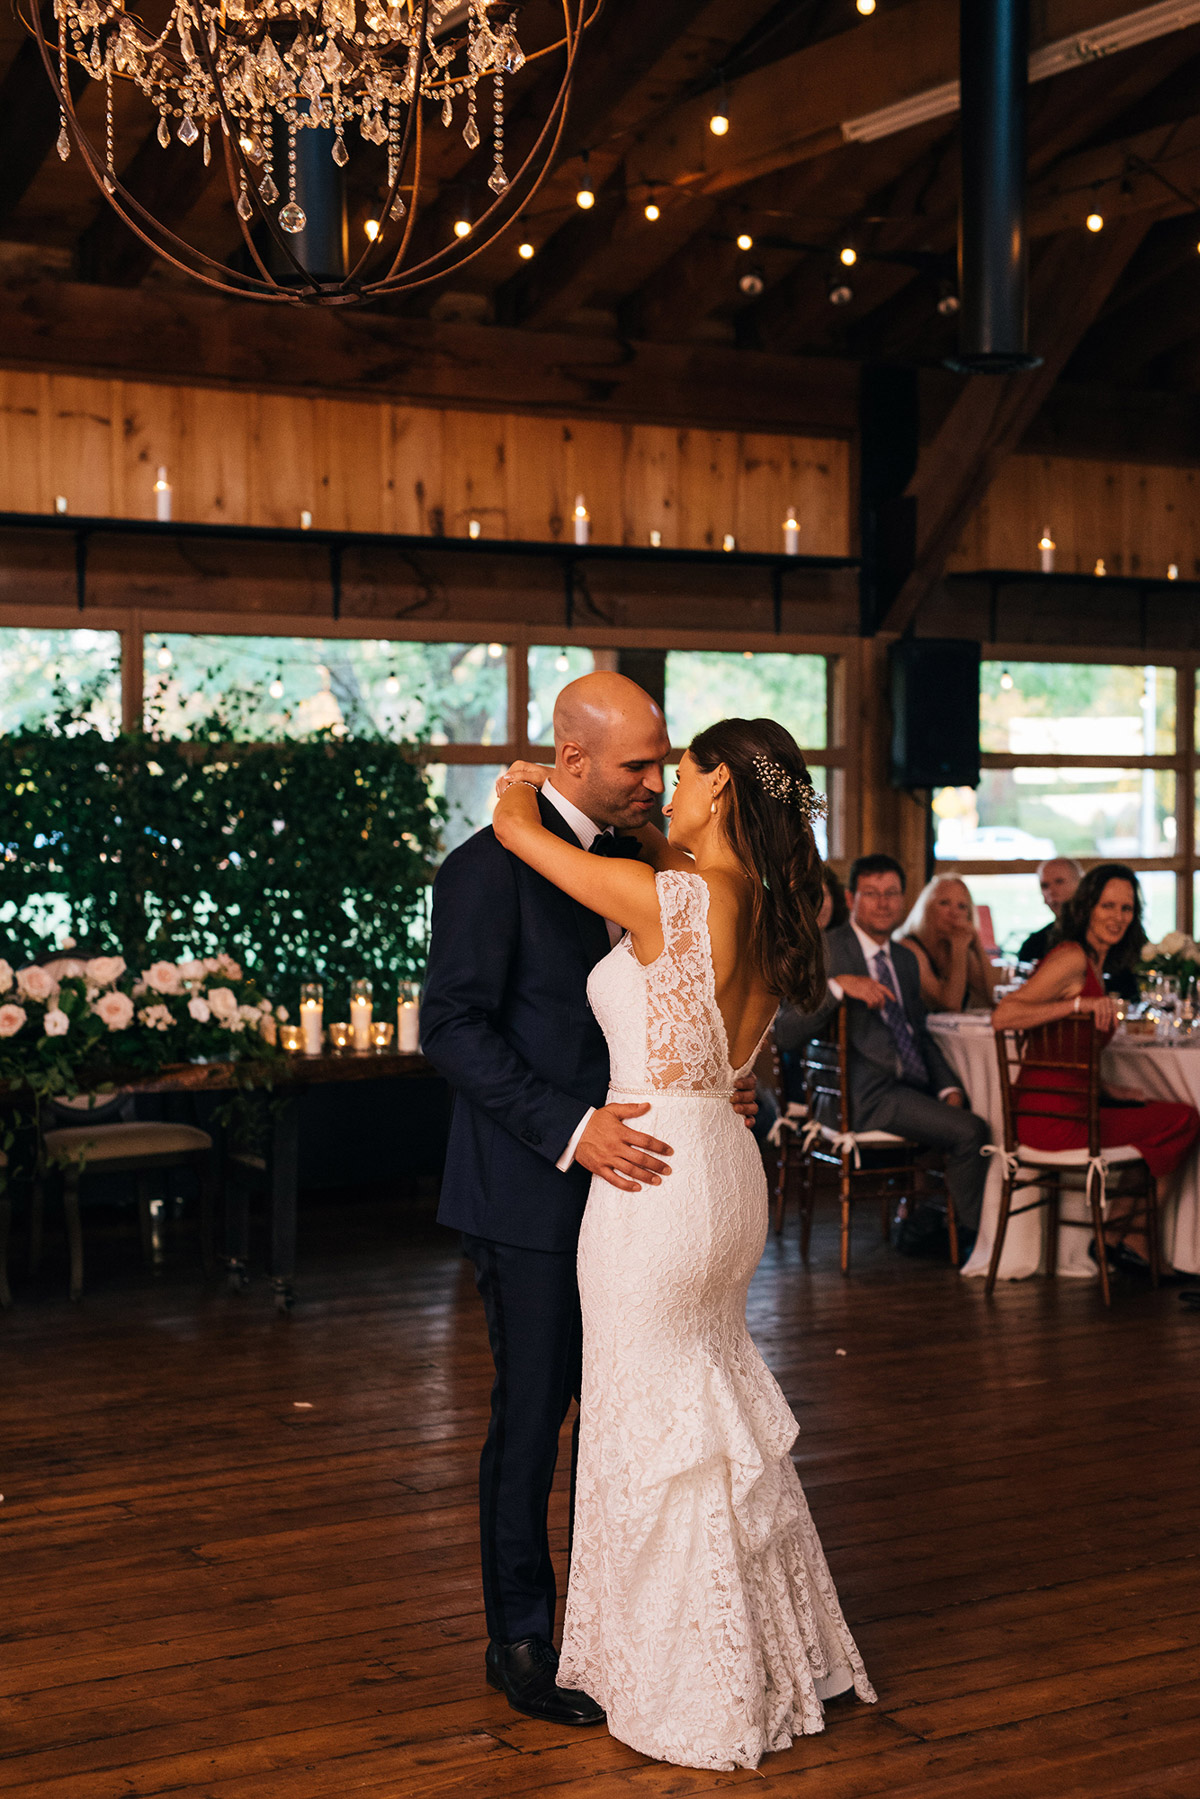 shaw-events-vineyard-bride-swish-list-kurtz-orchards-niagara-on-the-lake-wedding-34.jpg